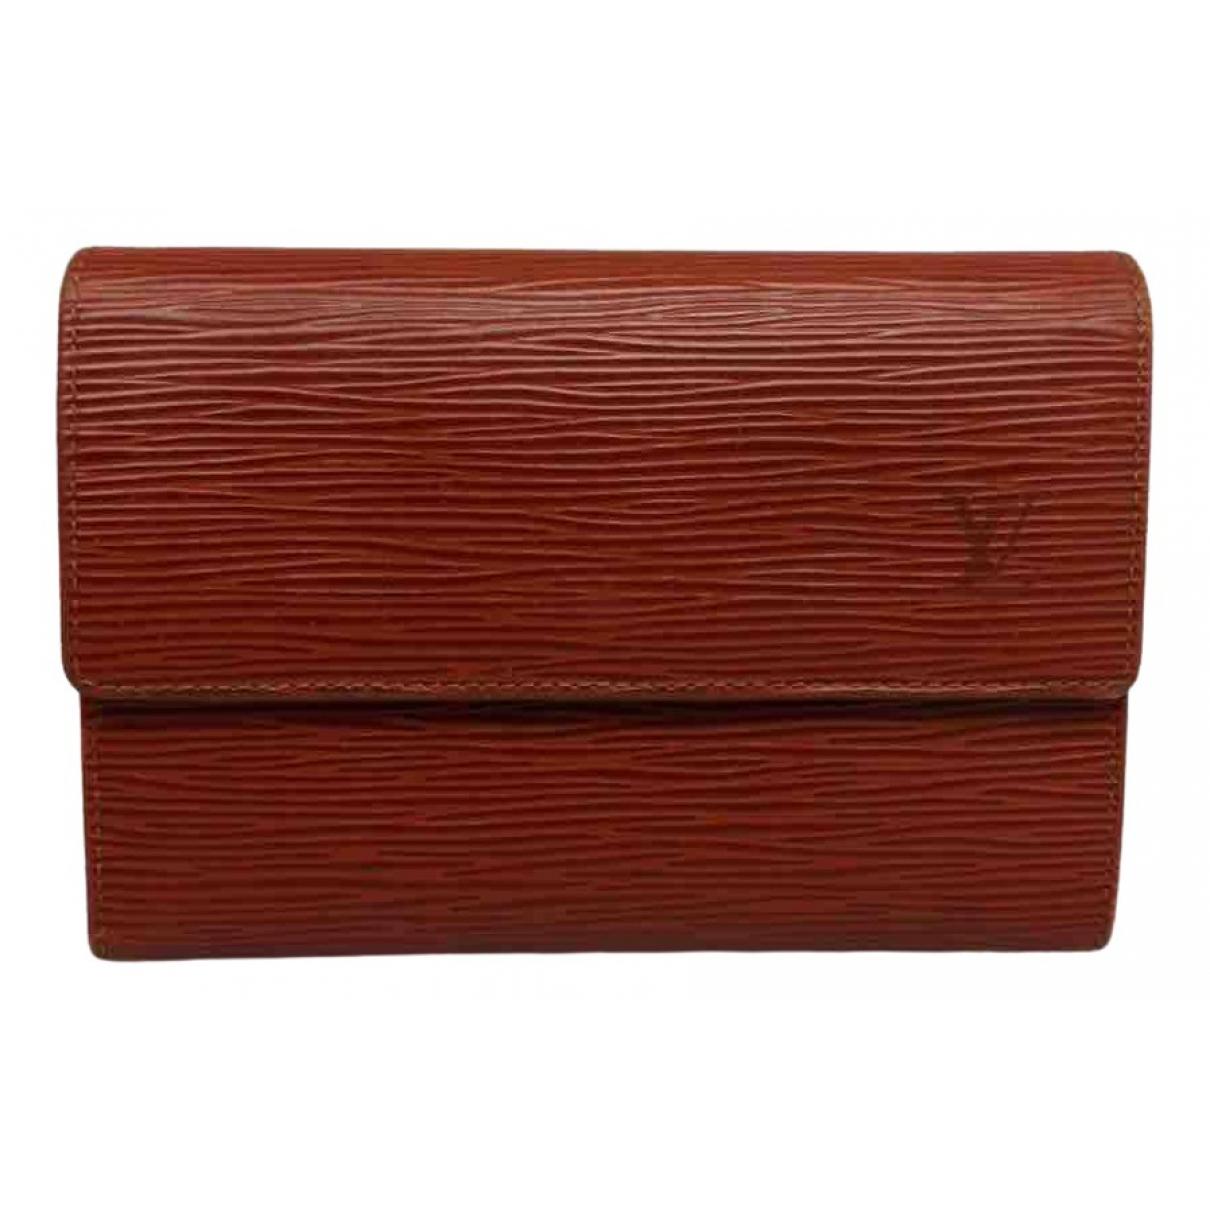 Louis Vuitton \N Camel Leather wallet for Women \N